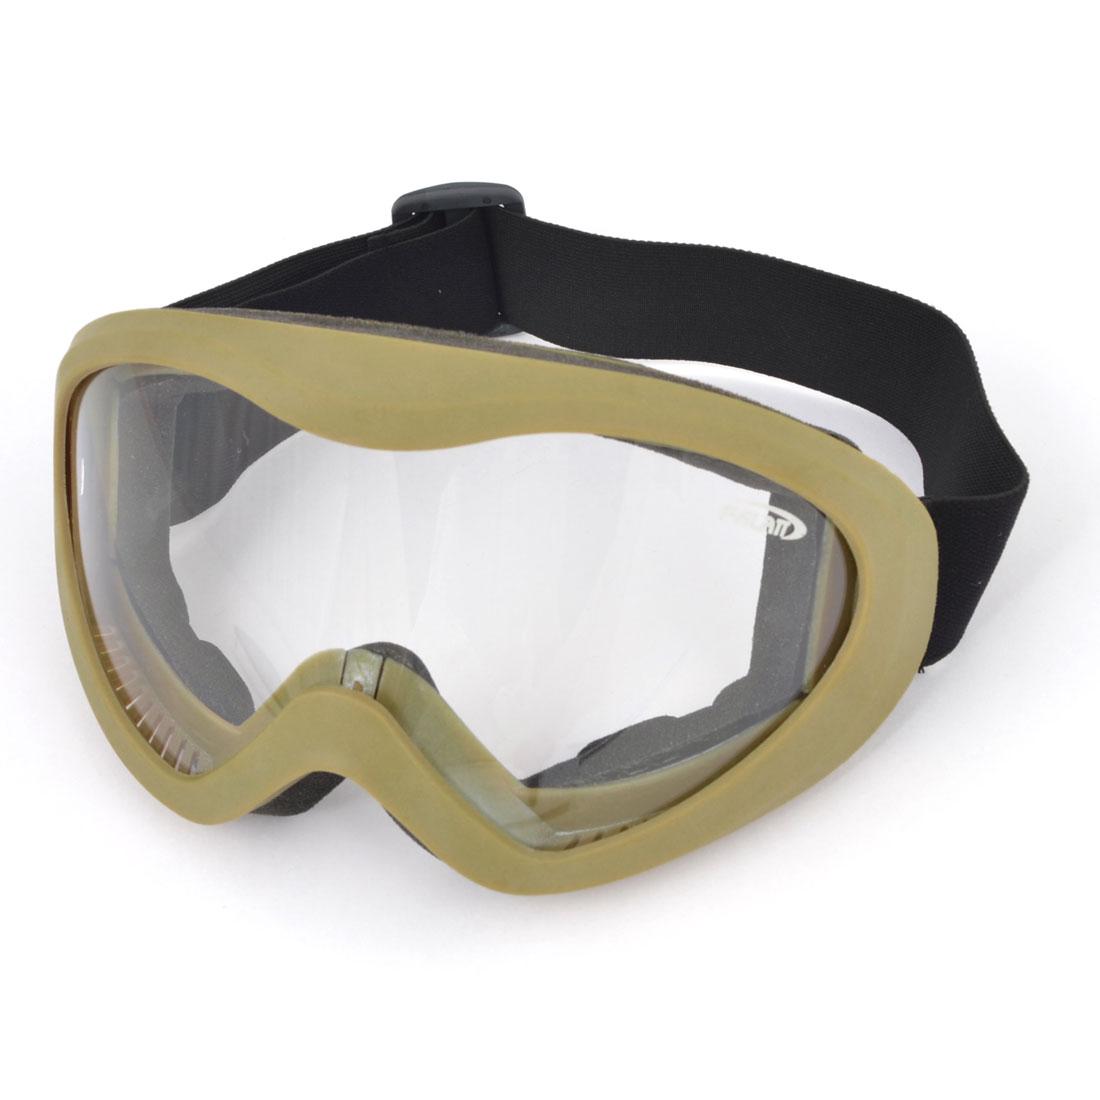 Khaki Winter Cycling Padded Glasses Anti Fog Ski Goggles Sunglasses